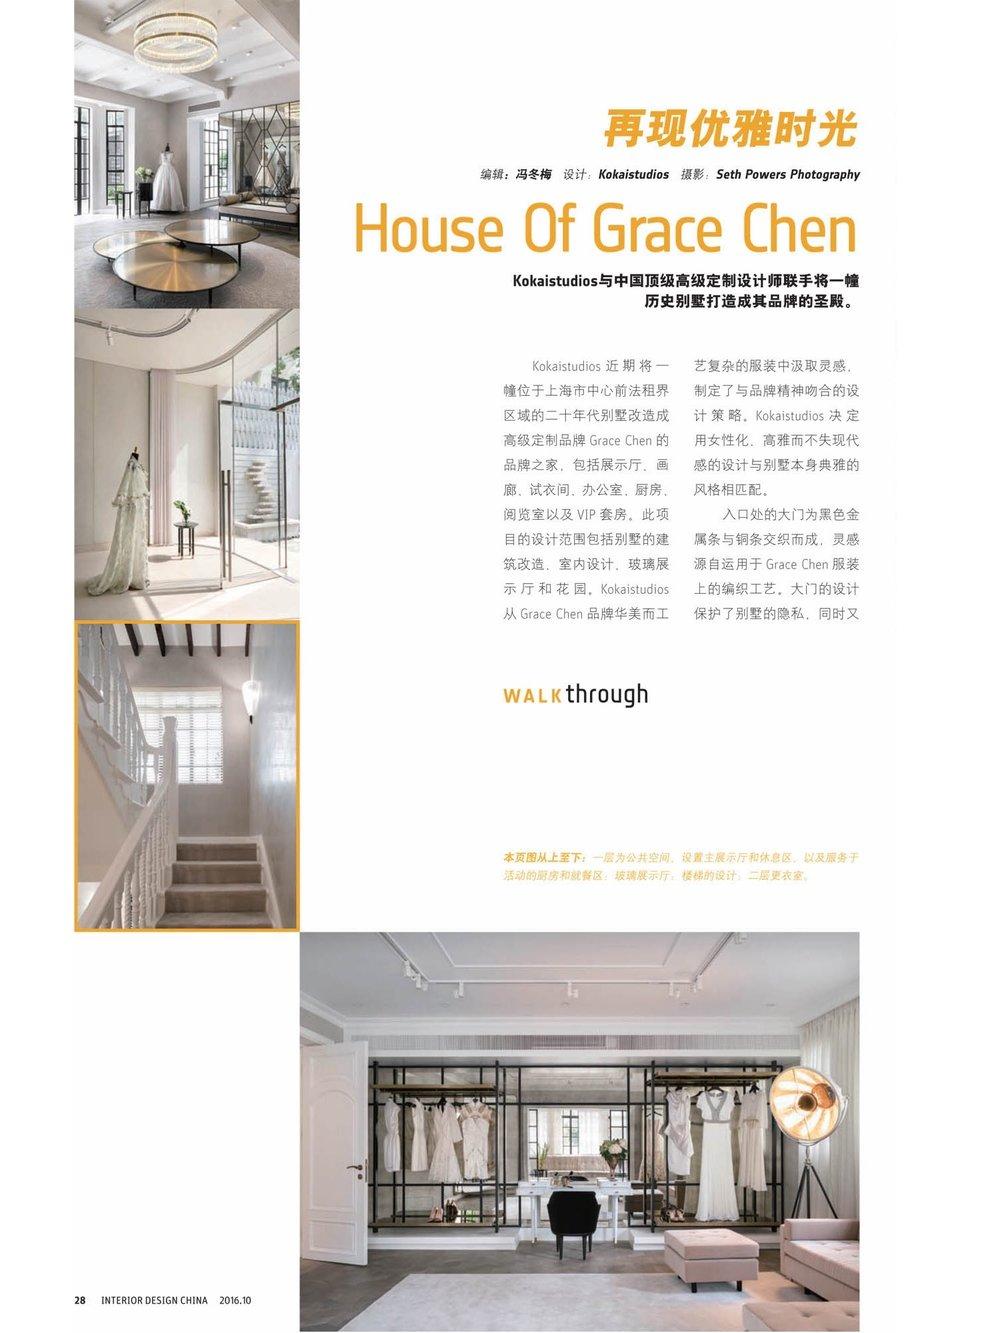 Interior Design China | October 2016 - House of Grace Chen | Kokaistudios